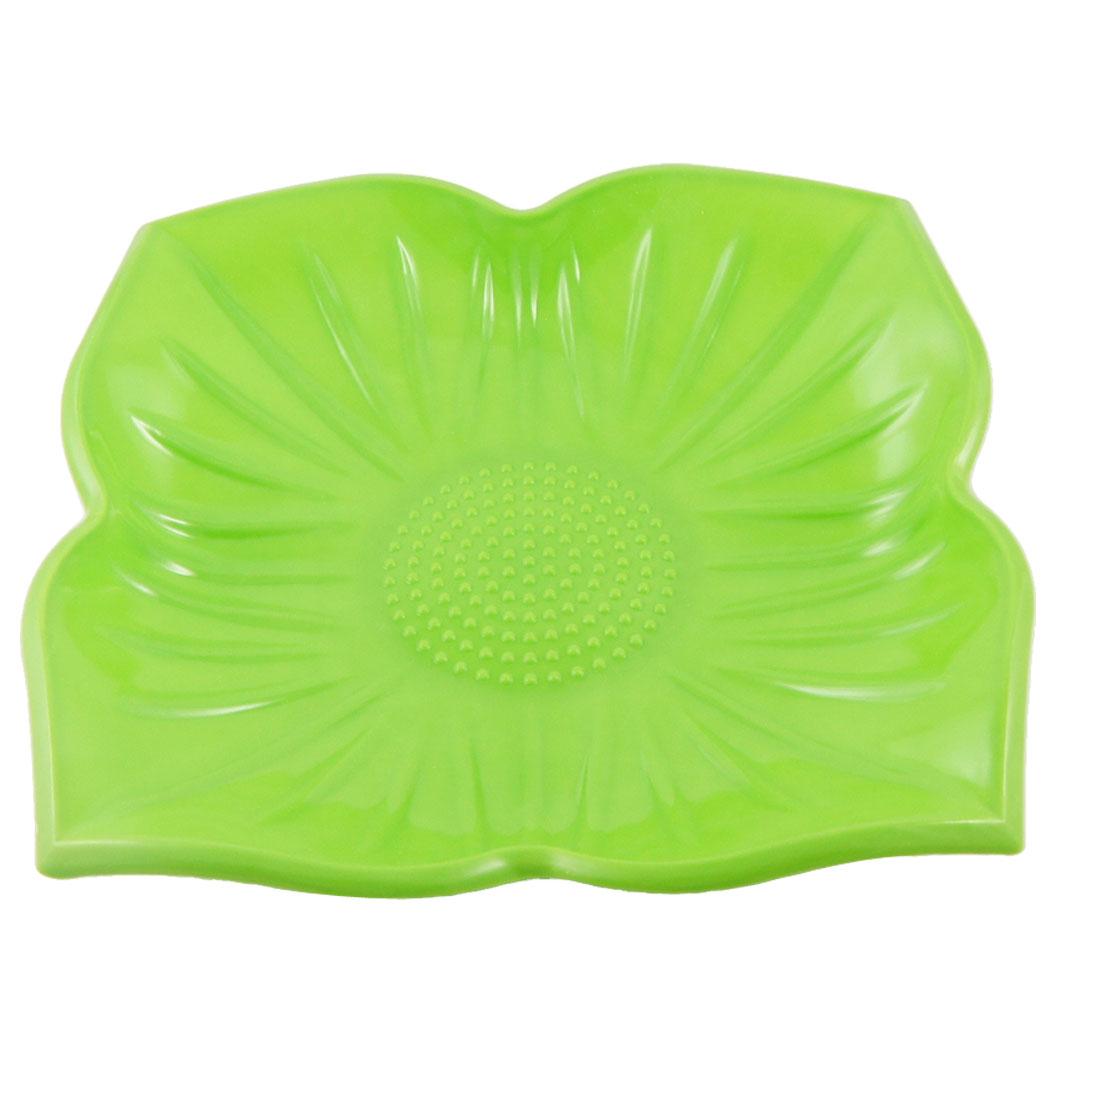 Plastic Green Floral Pattern Design Salad Fruit Plate Dish